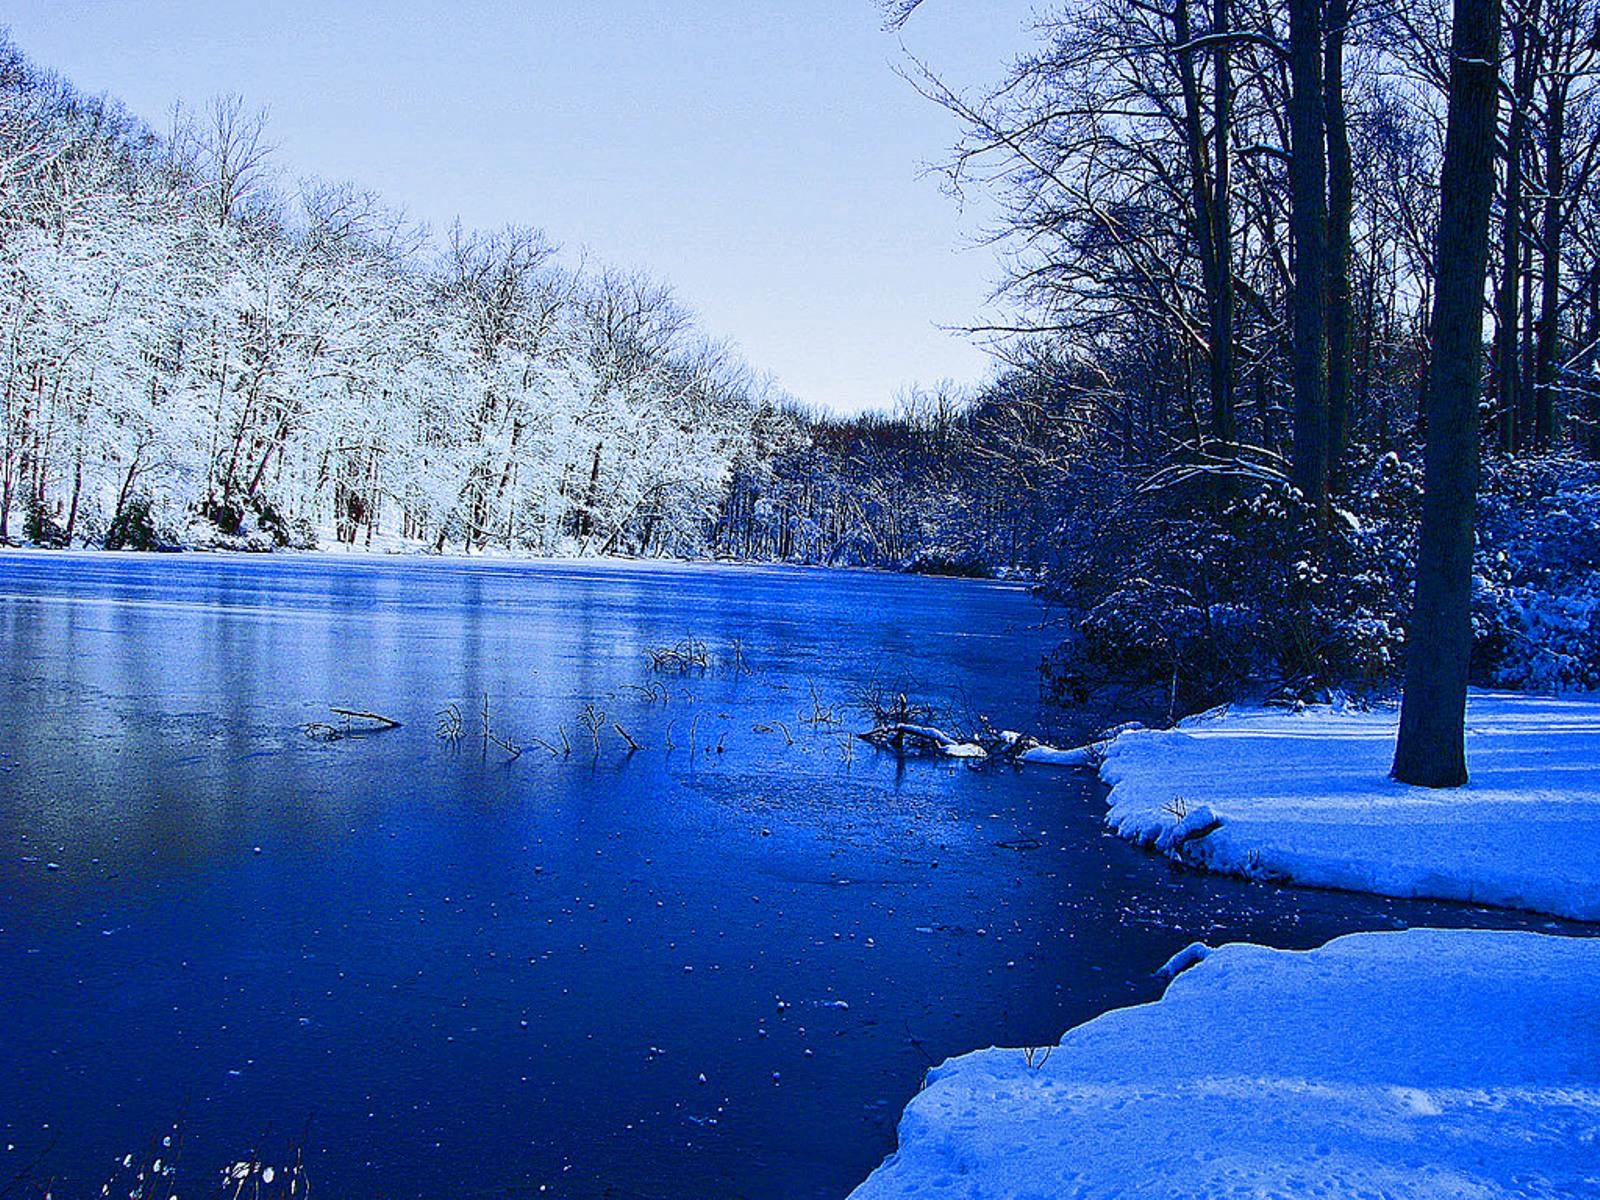 winter scenery winter scenery winter scenery winter scenery winter 1600x1200